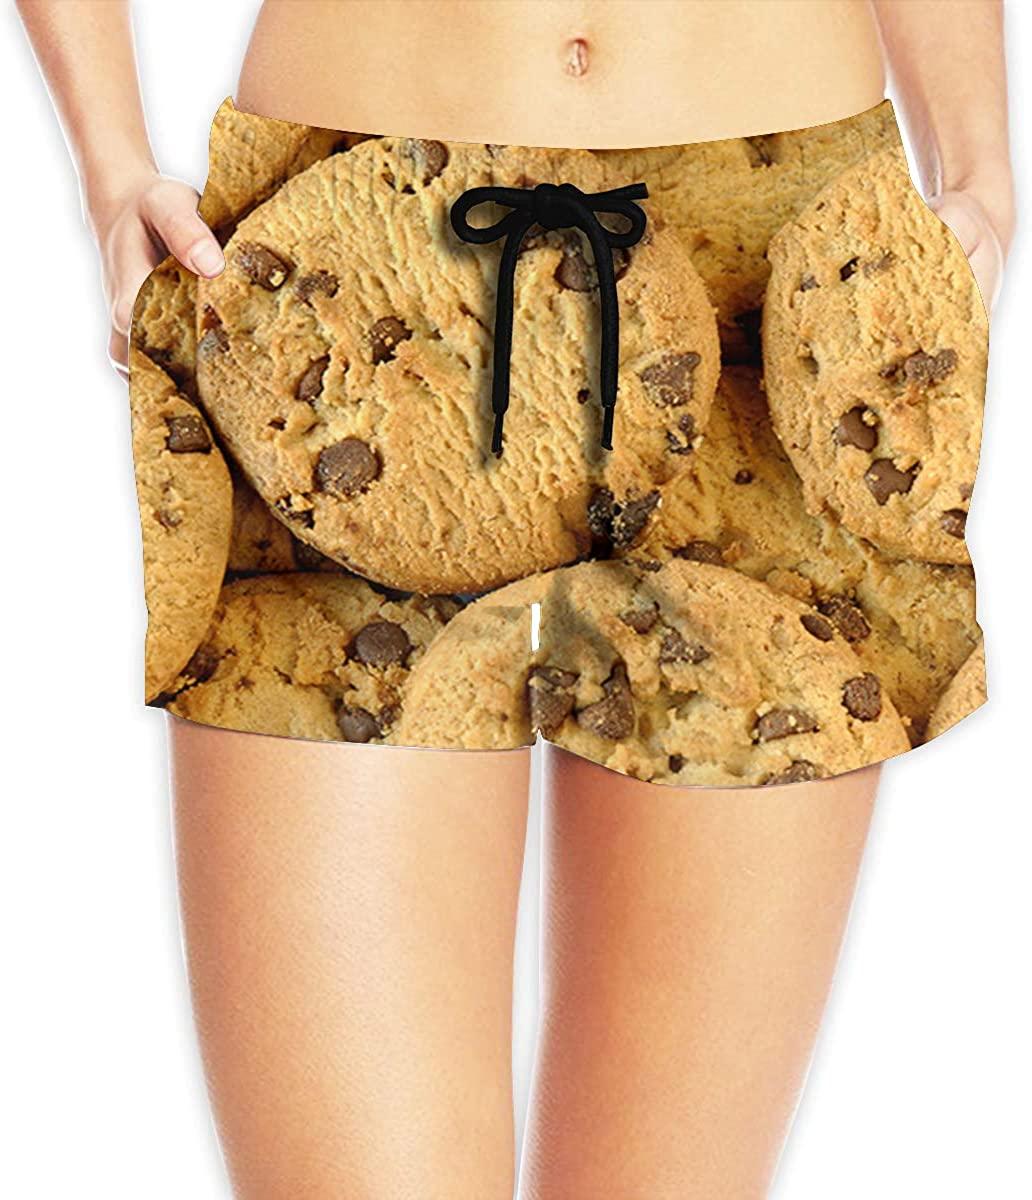 LzVong Chocolate Chip Cookie Women's Female Beach Pants Summer Beachwear Board Shorts